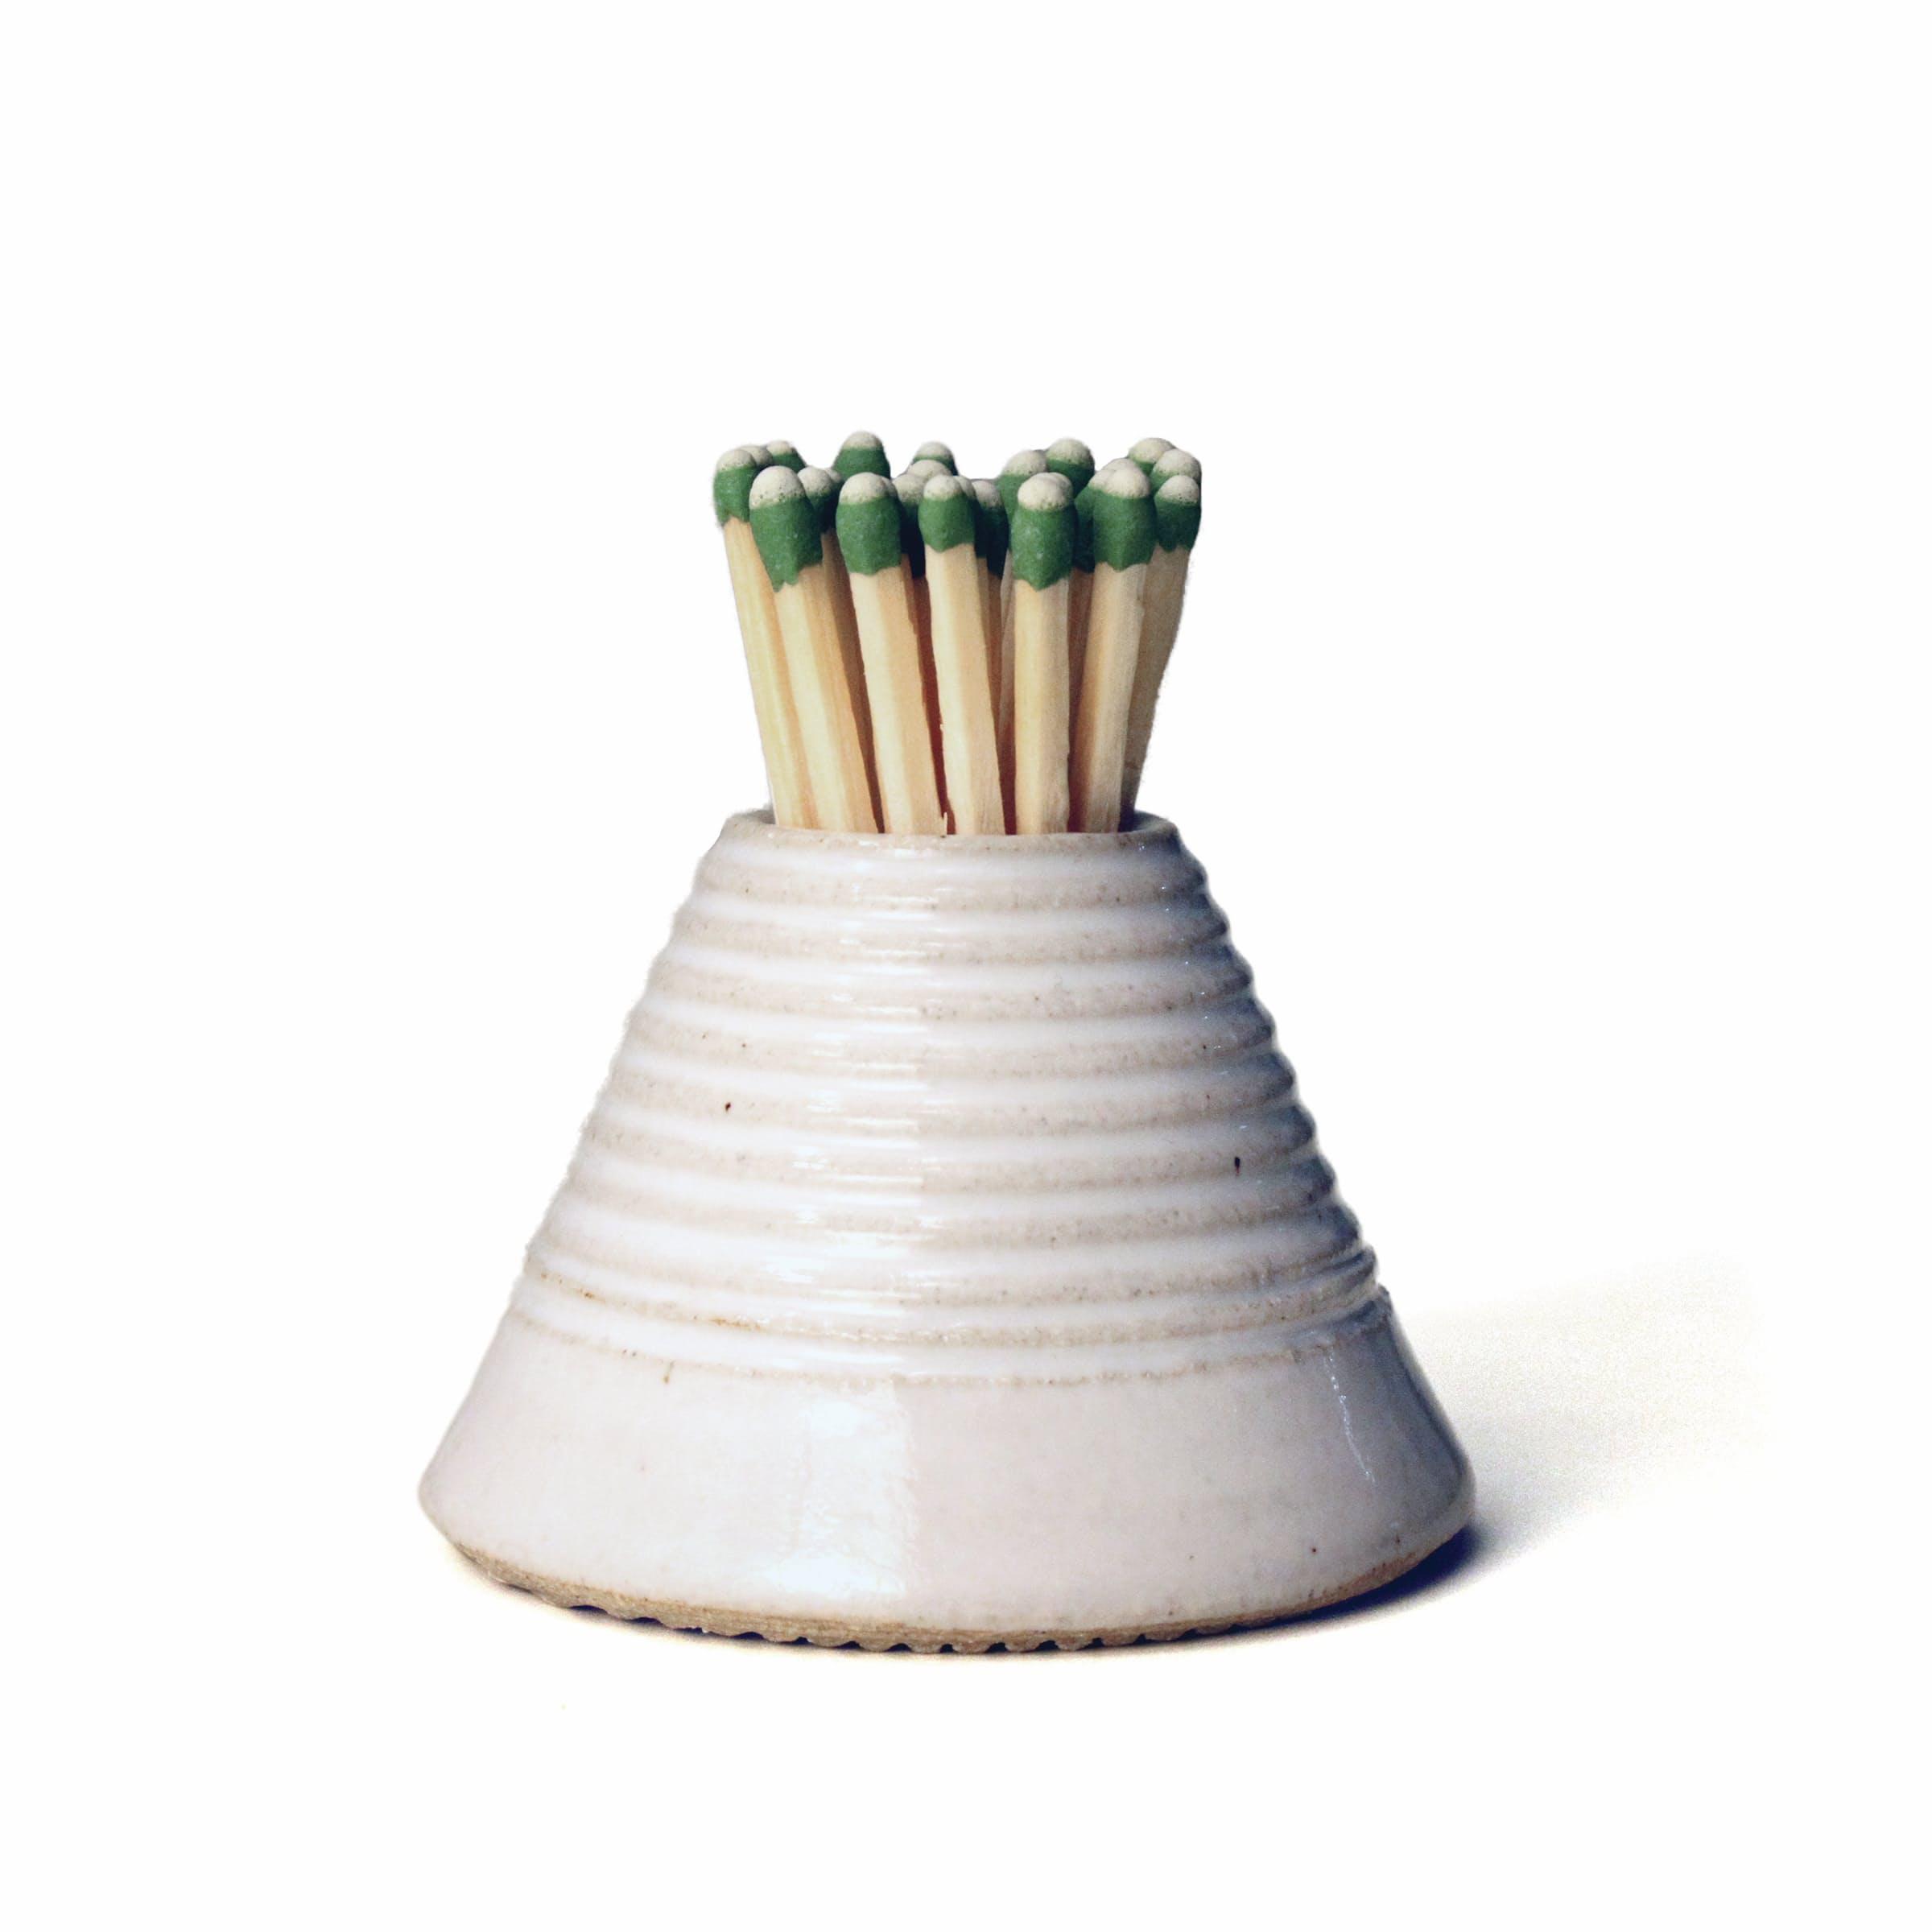 Vw1oss9zdq farmhouse pottery bistro match striker 0 original